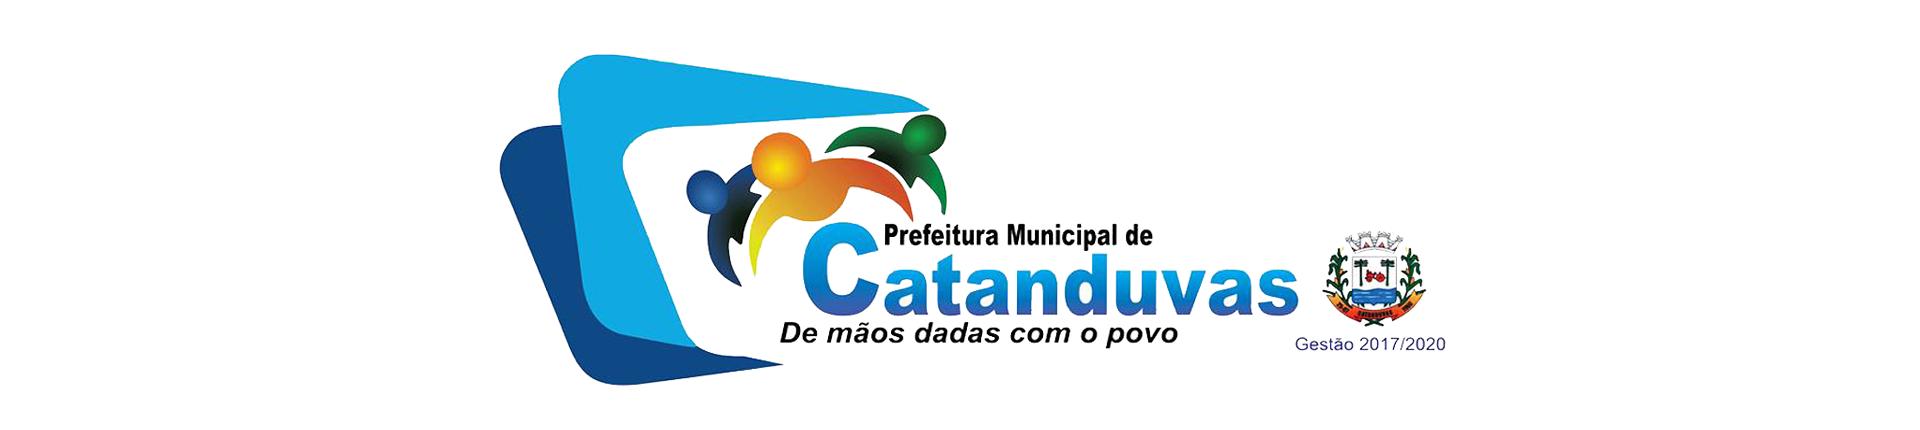 LOGO - PREFEITURA MUNICIPAL DE CATANDUVAS